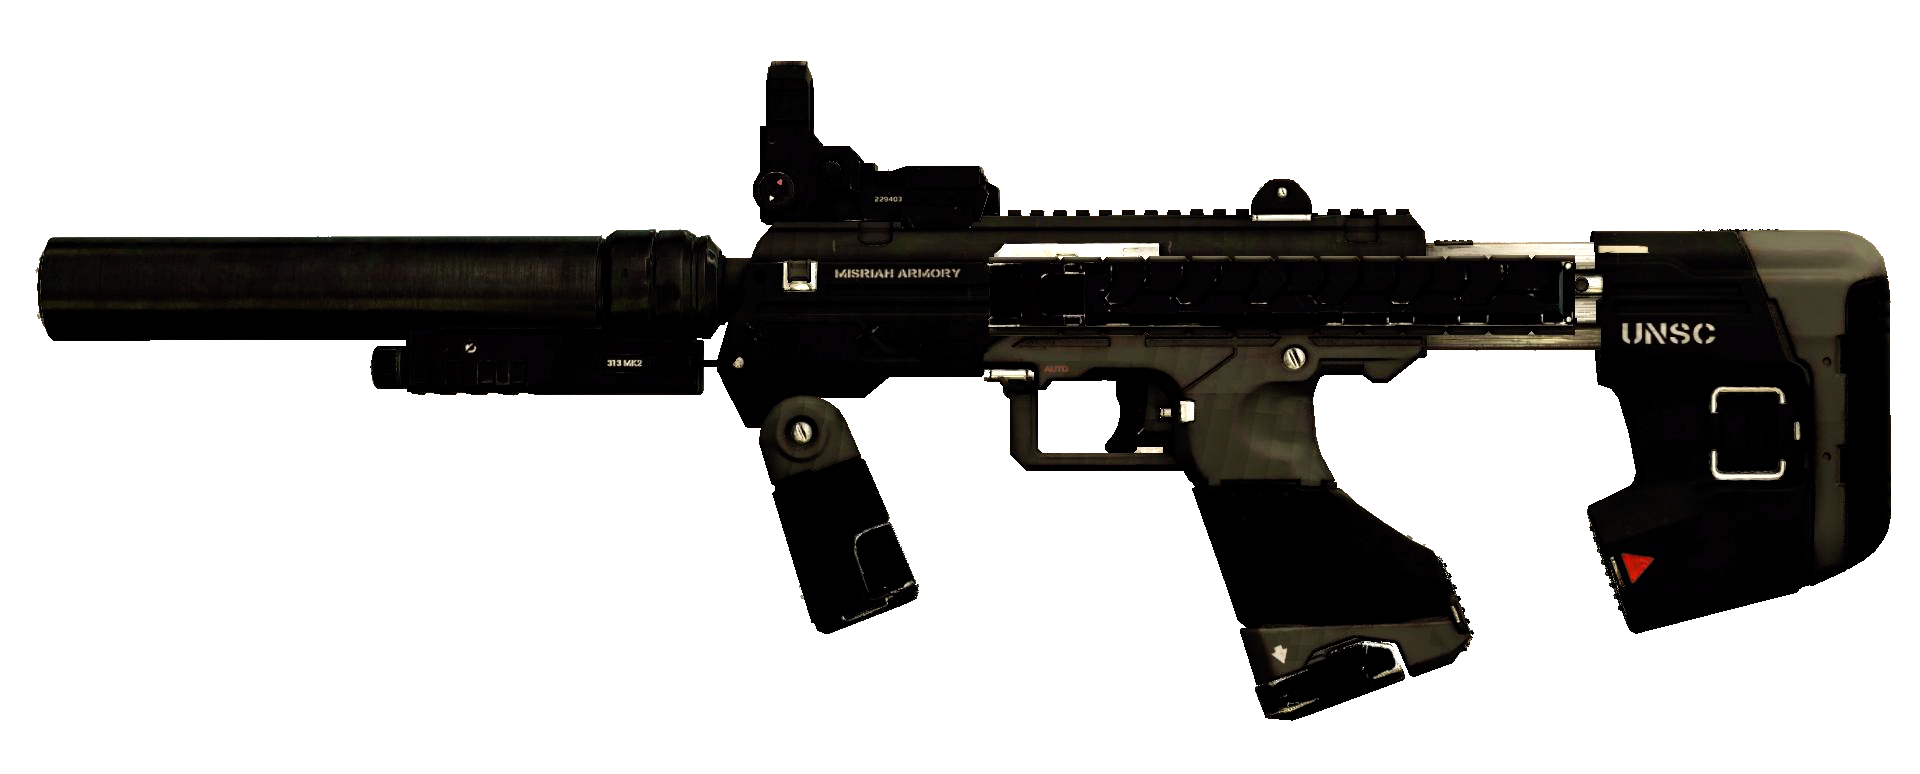 m7s caseless submachine gun halo nation fandom powered by wikia